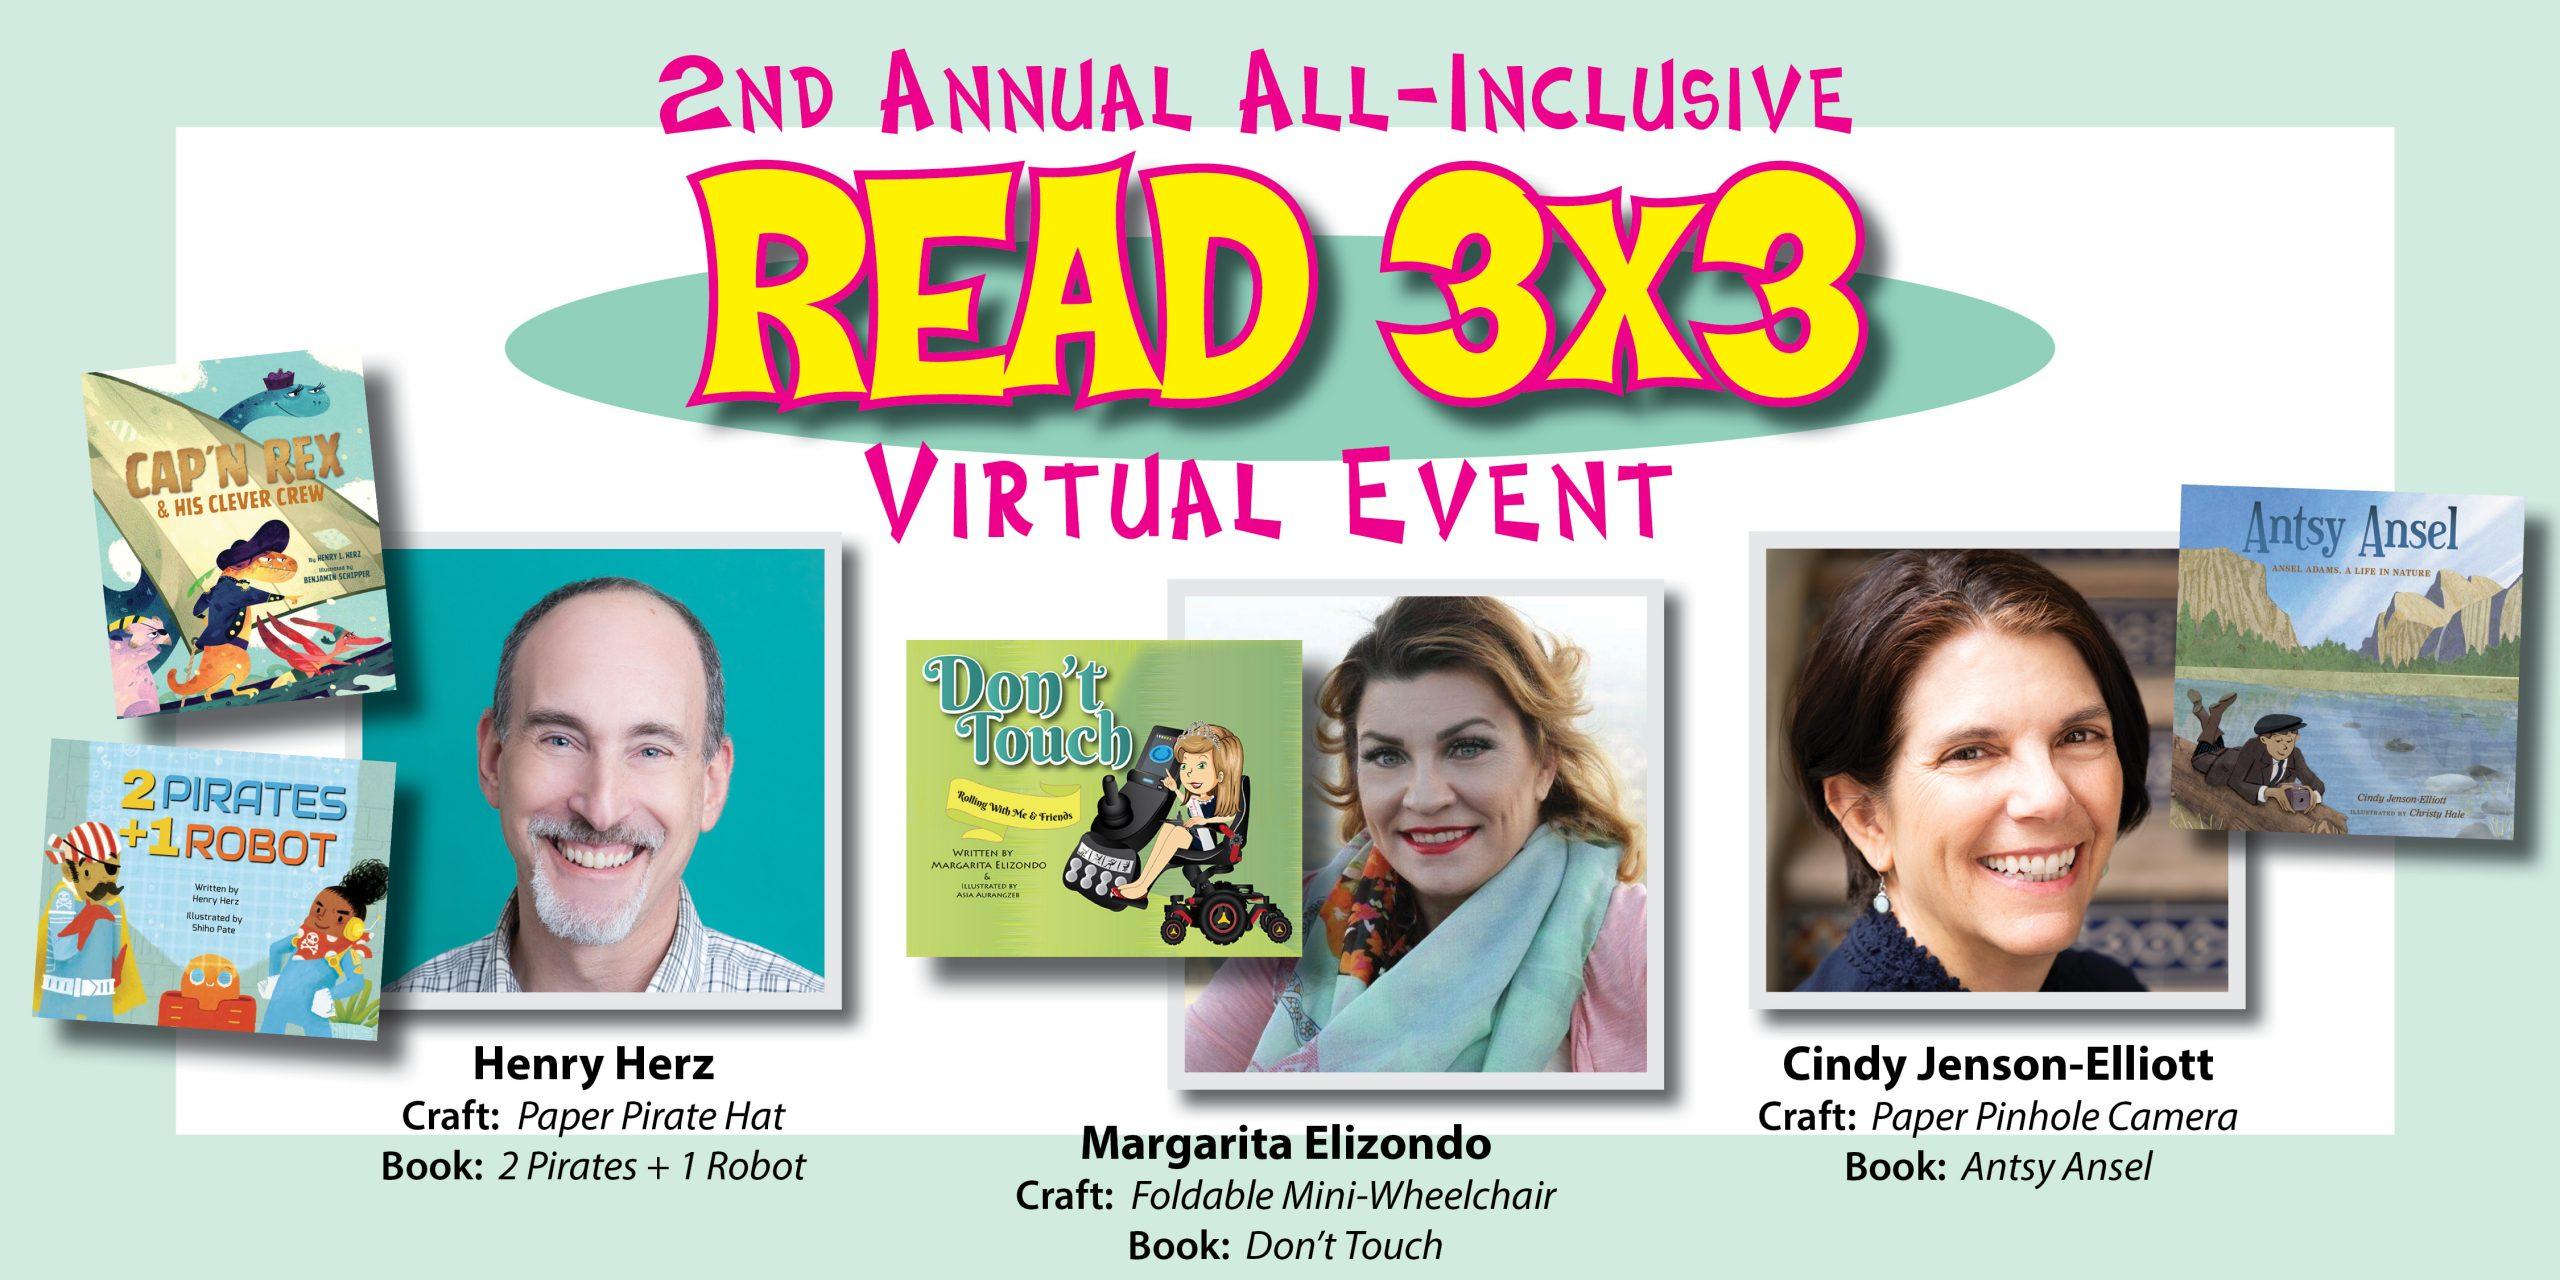 All-Inclusive Virtual READ 3X3 Literacy Event Success